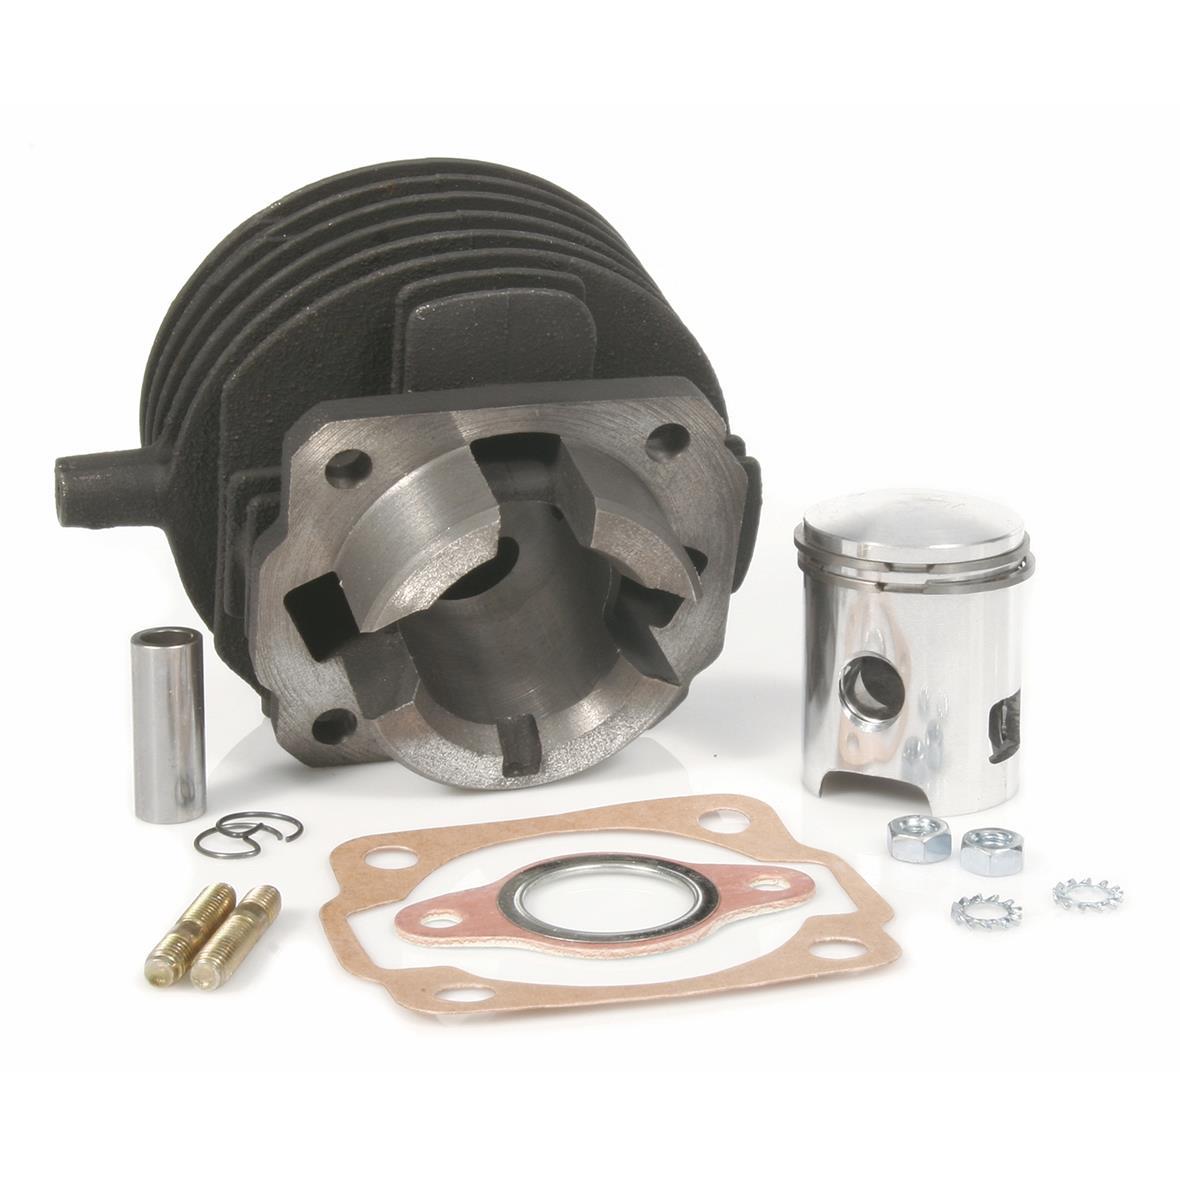 Zdjęcie produktu dla 'Cylinder rajdowy D.R. 50 ccmTitle'